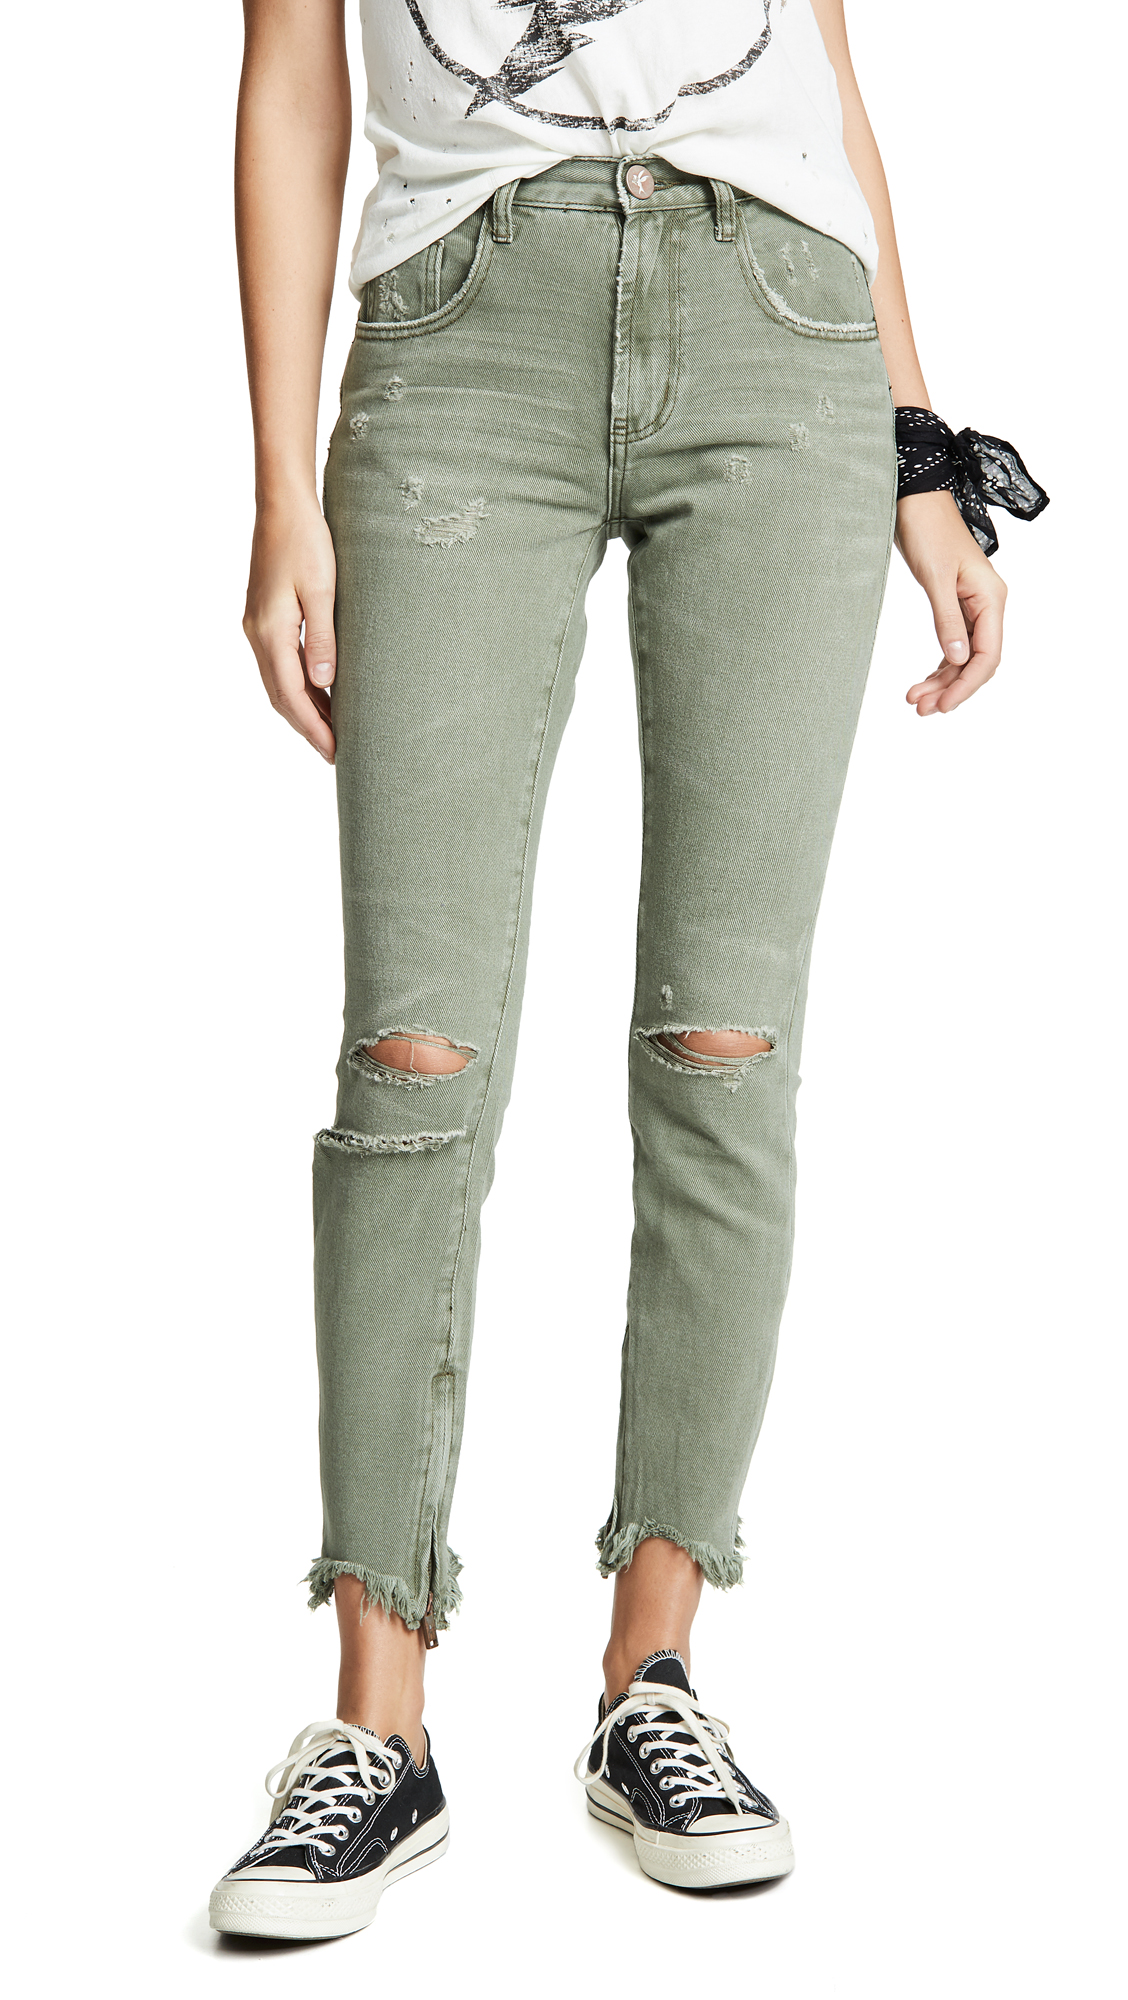 ONE TEASPOON Freebird High Waisted Jeans in Super Khaki